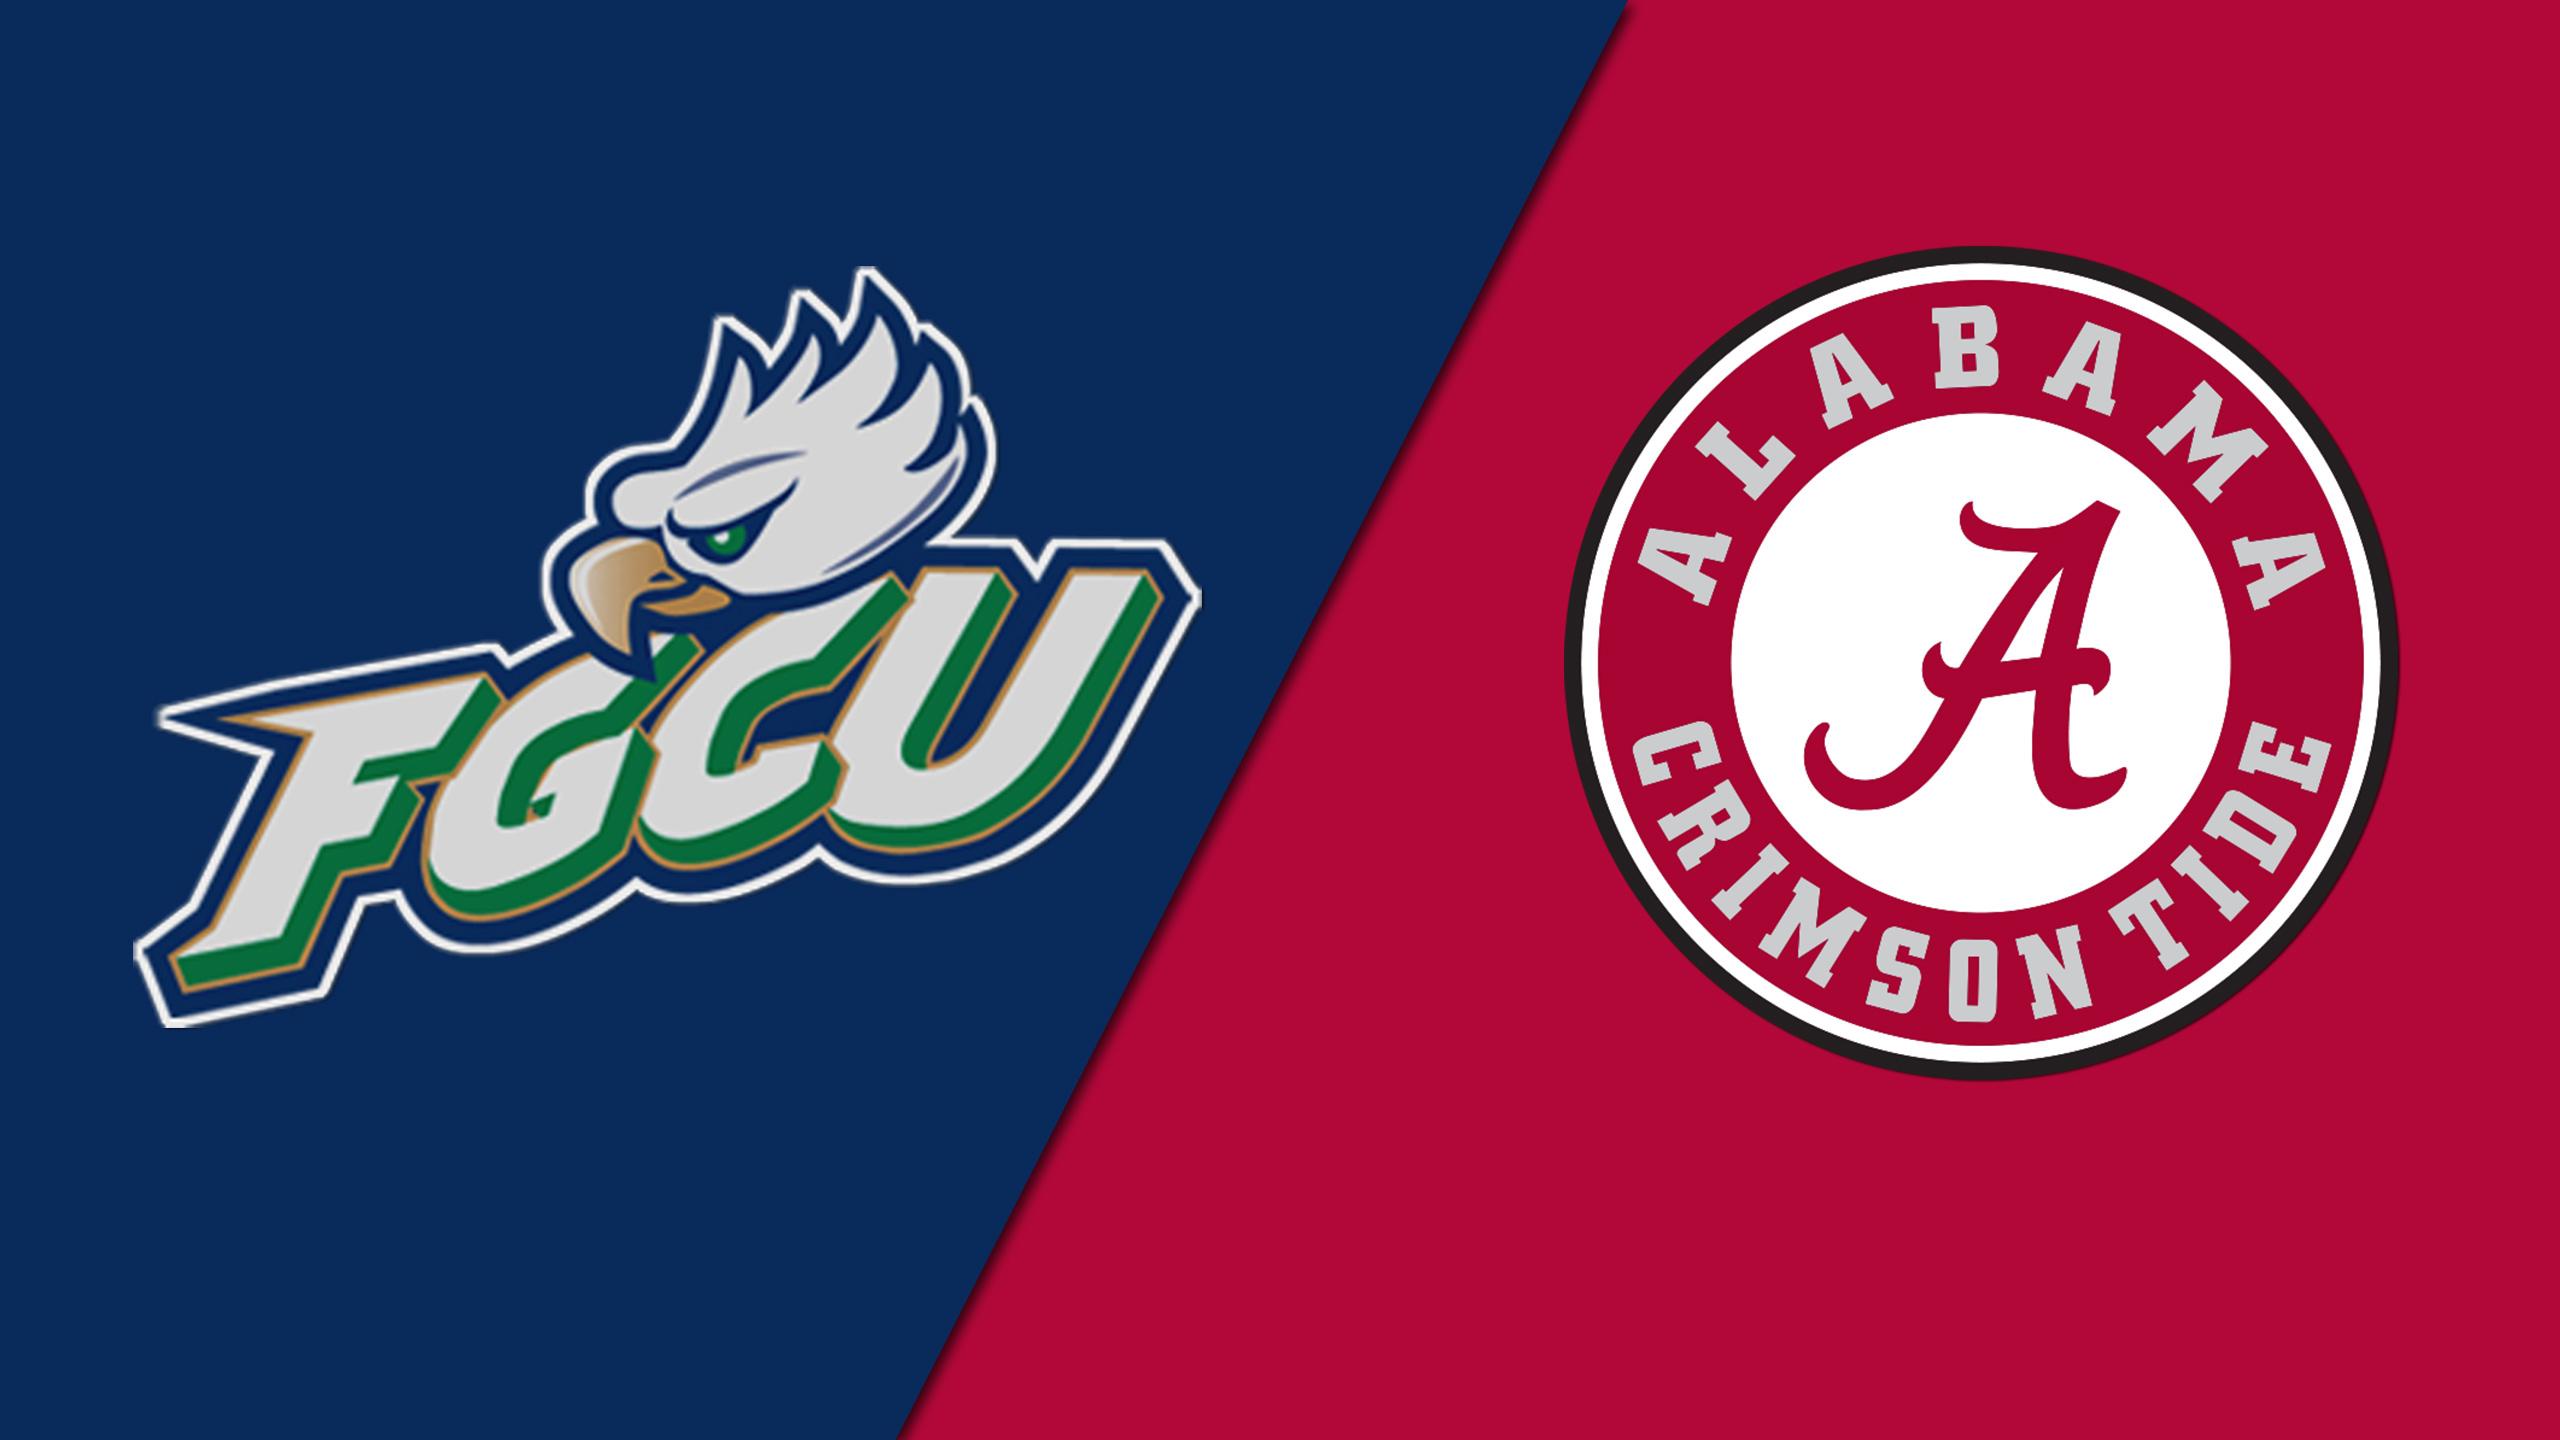 Florida Gulf Coast vs. Alabama (W Soccer)